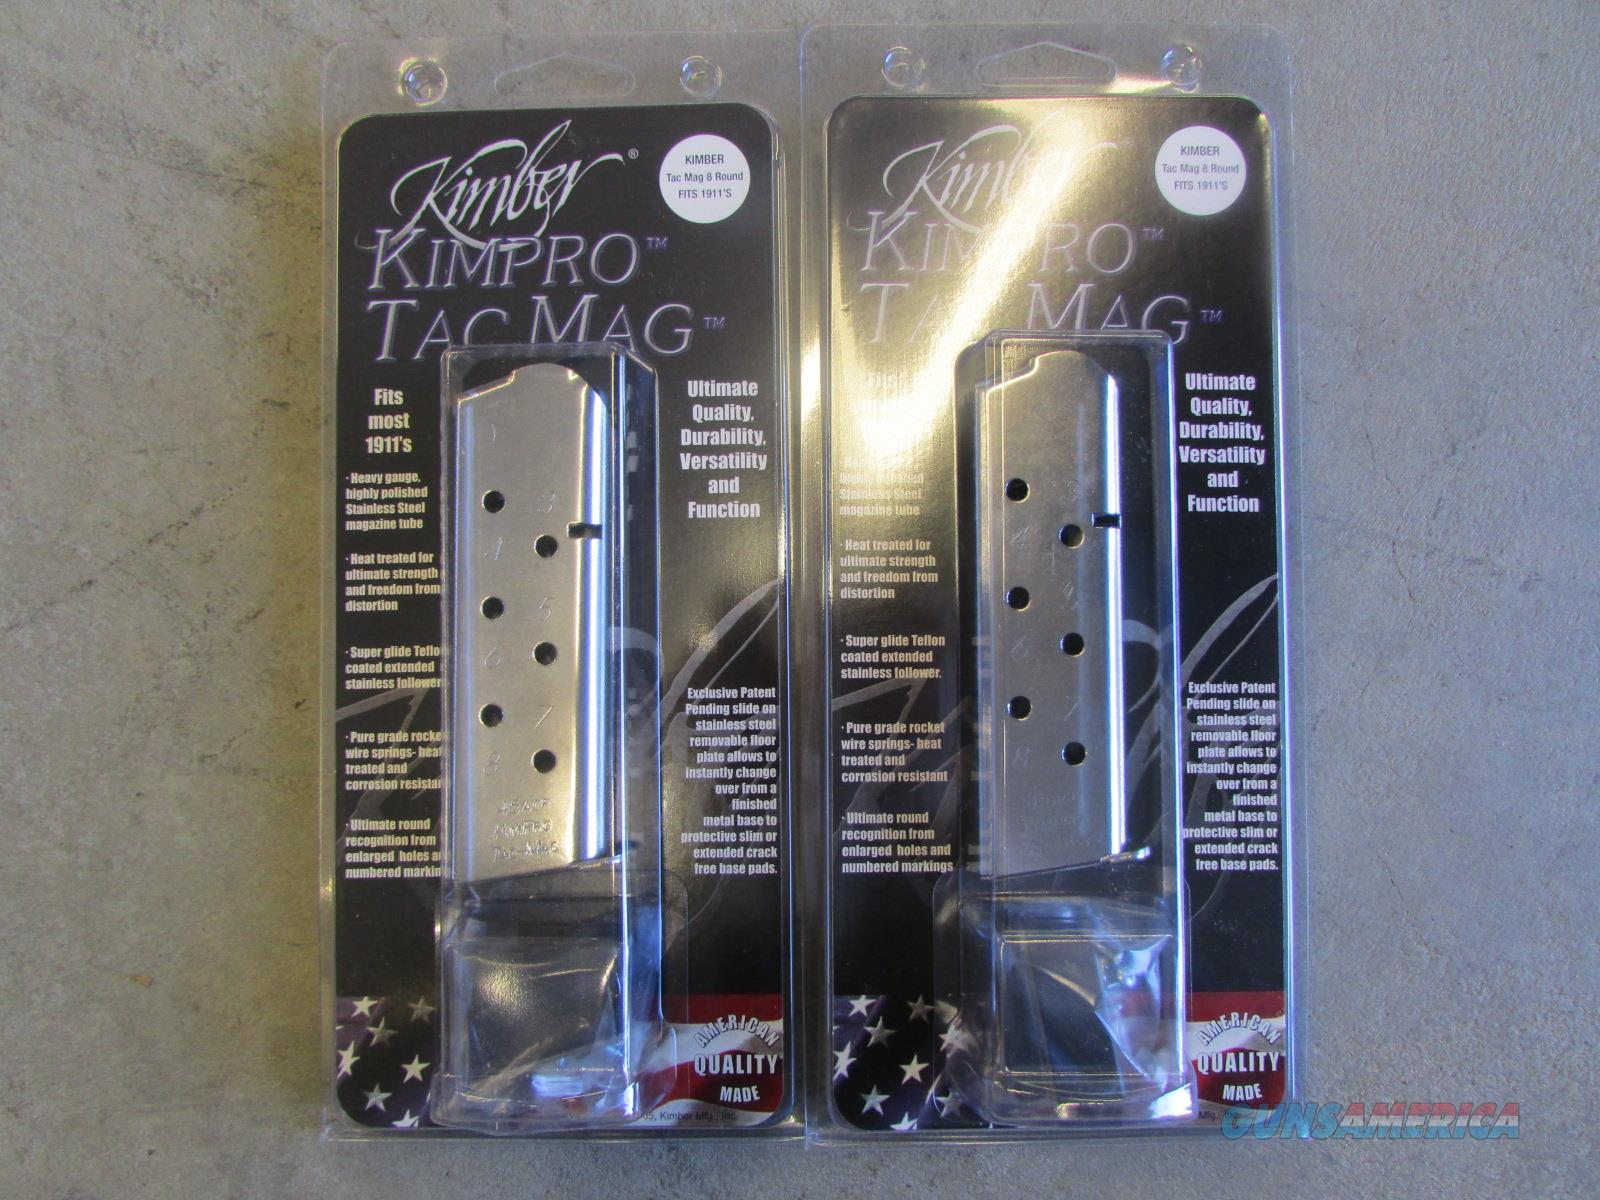 (2) Kimber KimPro Tac-Mags .45 ACP 8rd w/ FREE SHIPPING 1100721  Non-Guns > Magazines & Clips > Pistol Magazines > 1911